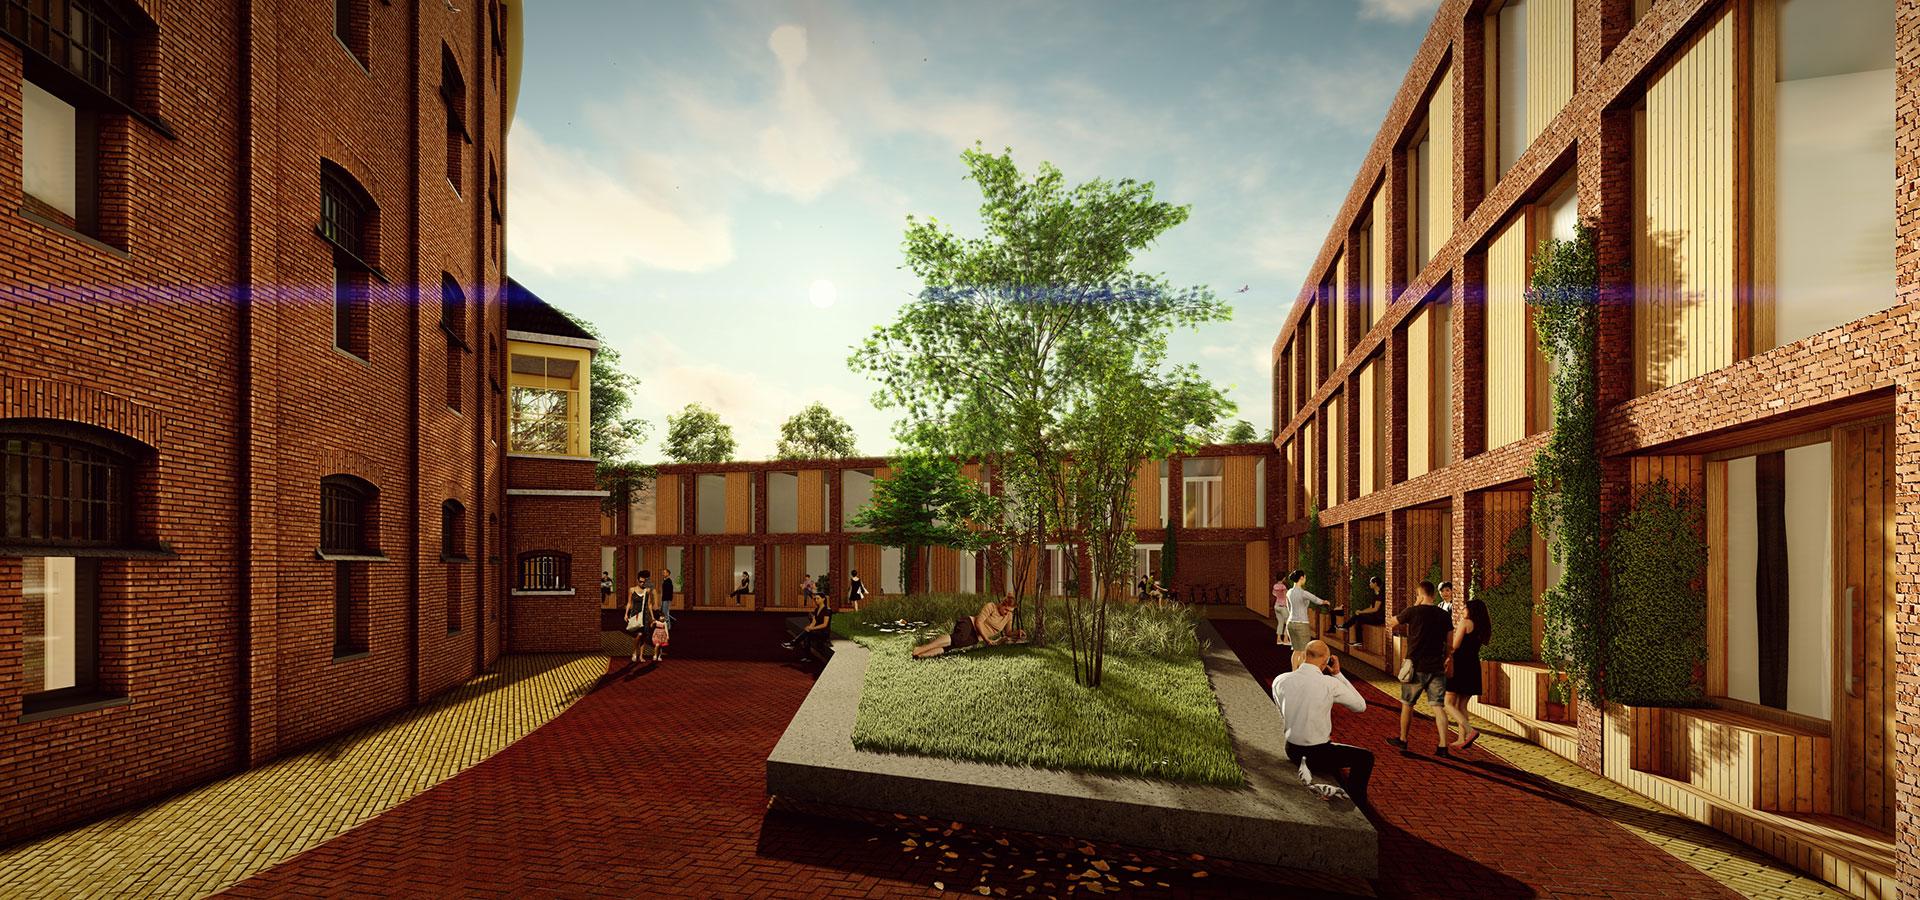 FARO architecten Koepel Haarlem 01